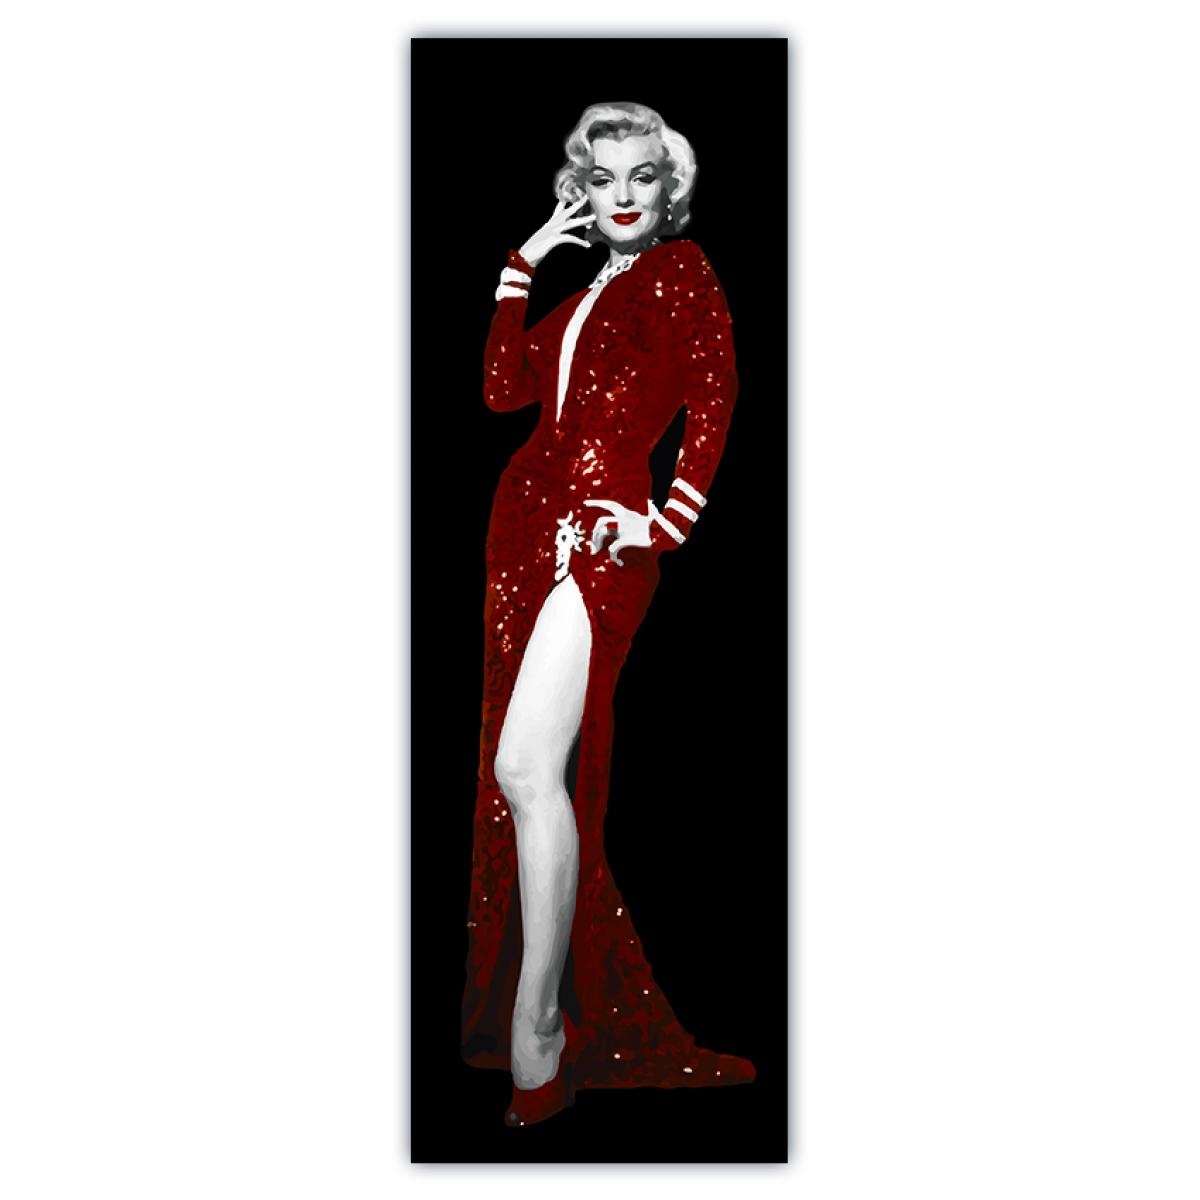 Quadri su canvas | Marilyn Monroe quadri moderni | LivingDECO\'